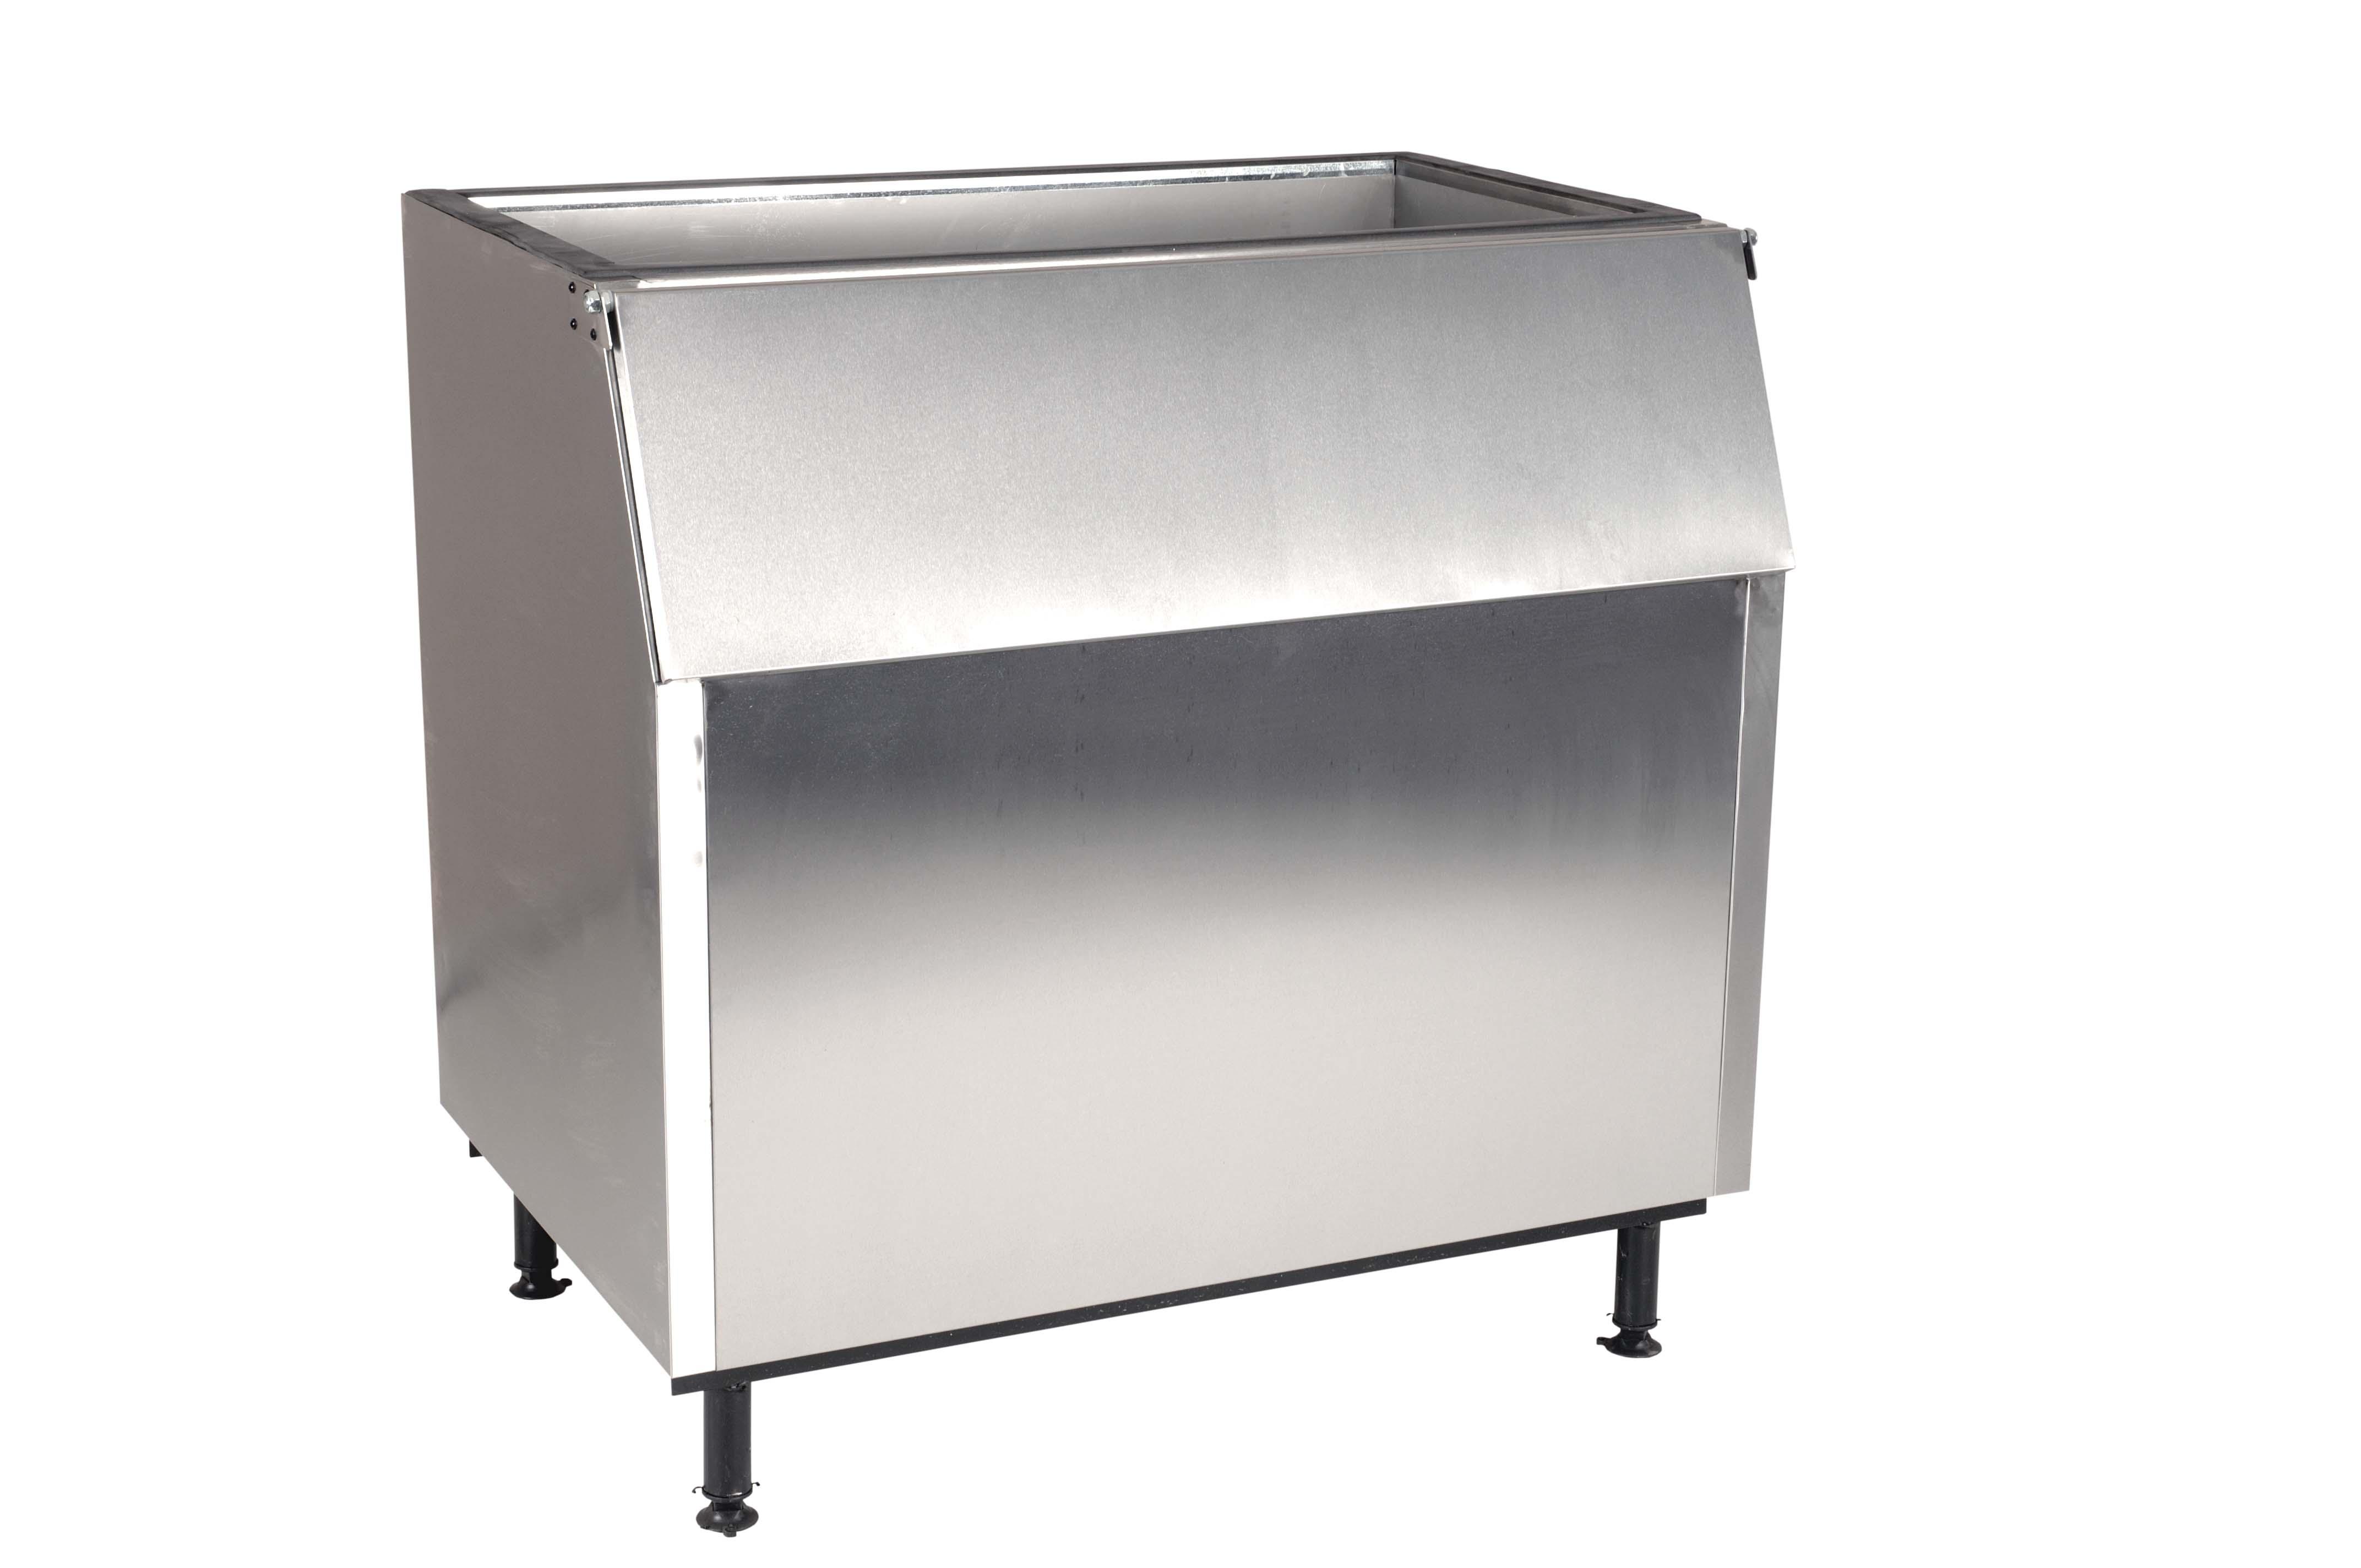 imb1300--ice-maker-bin--ststeel--400kg